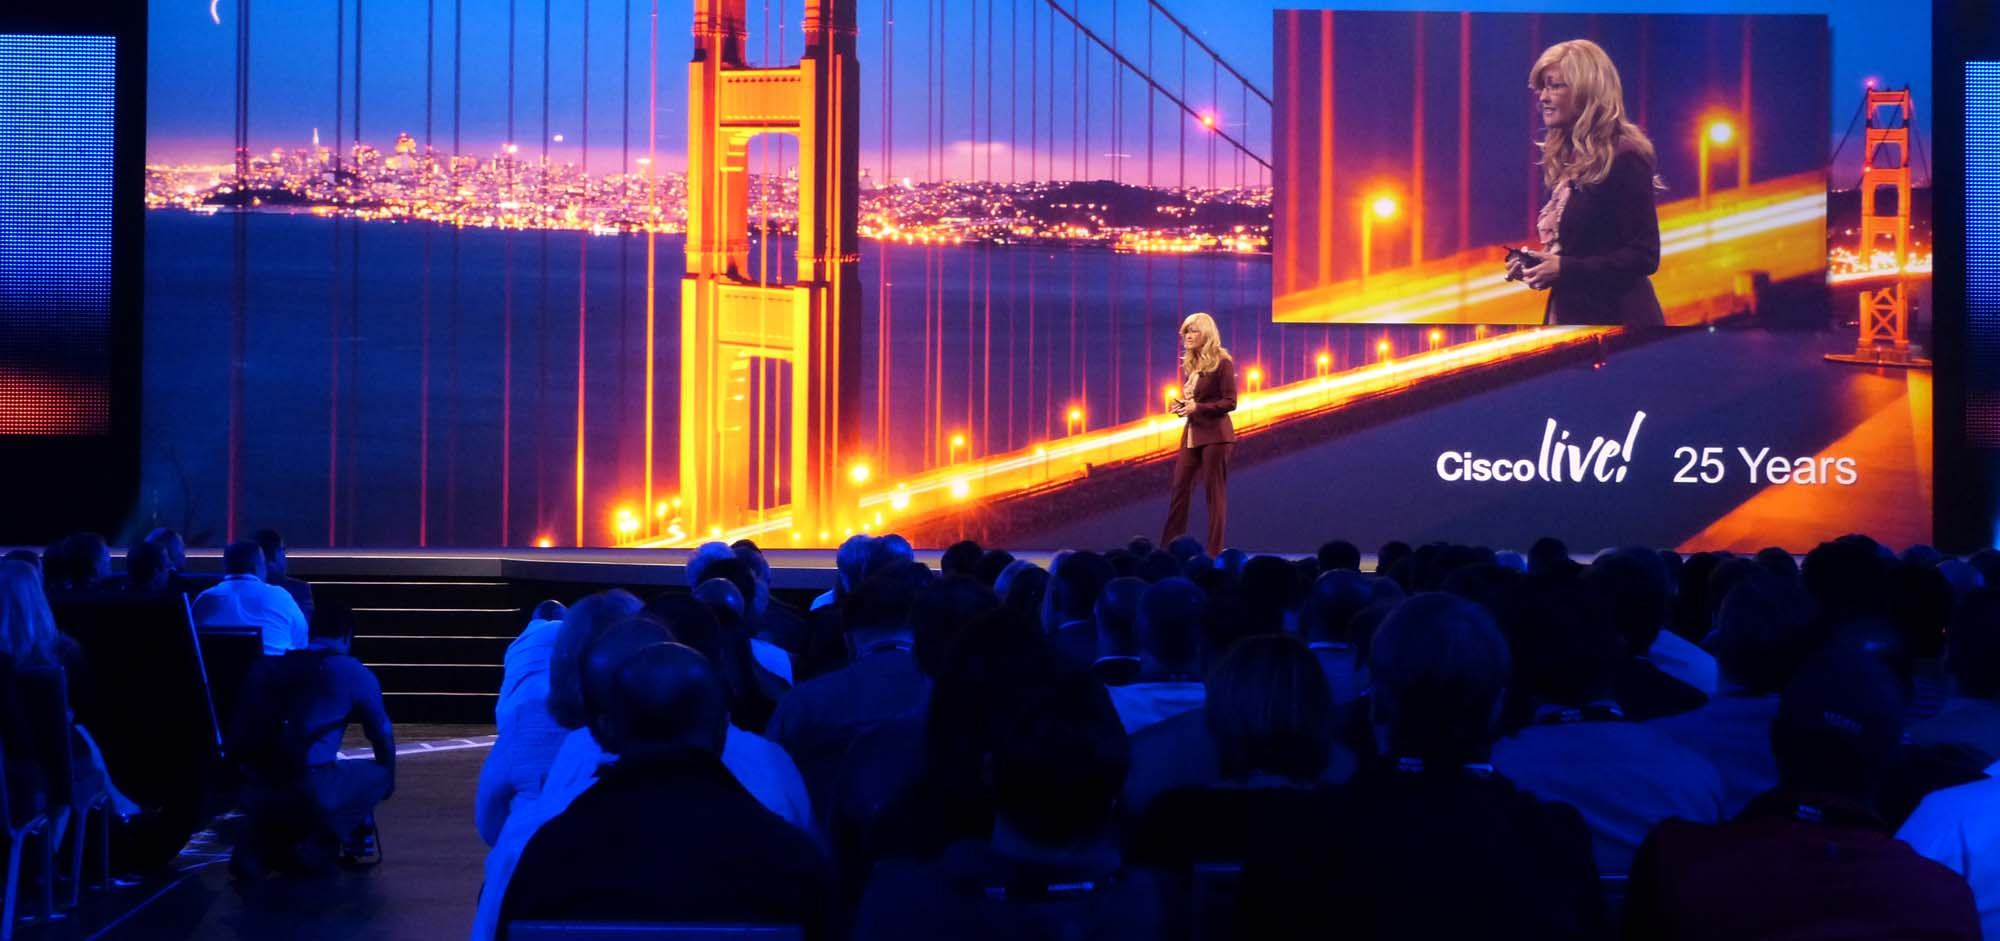 cisco_live_2014_keynote